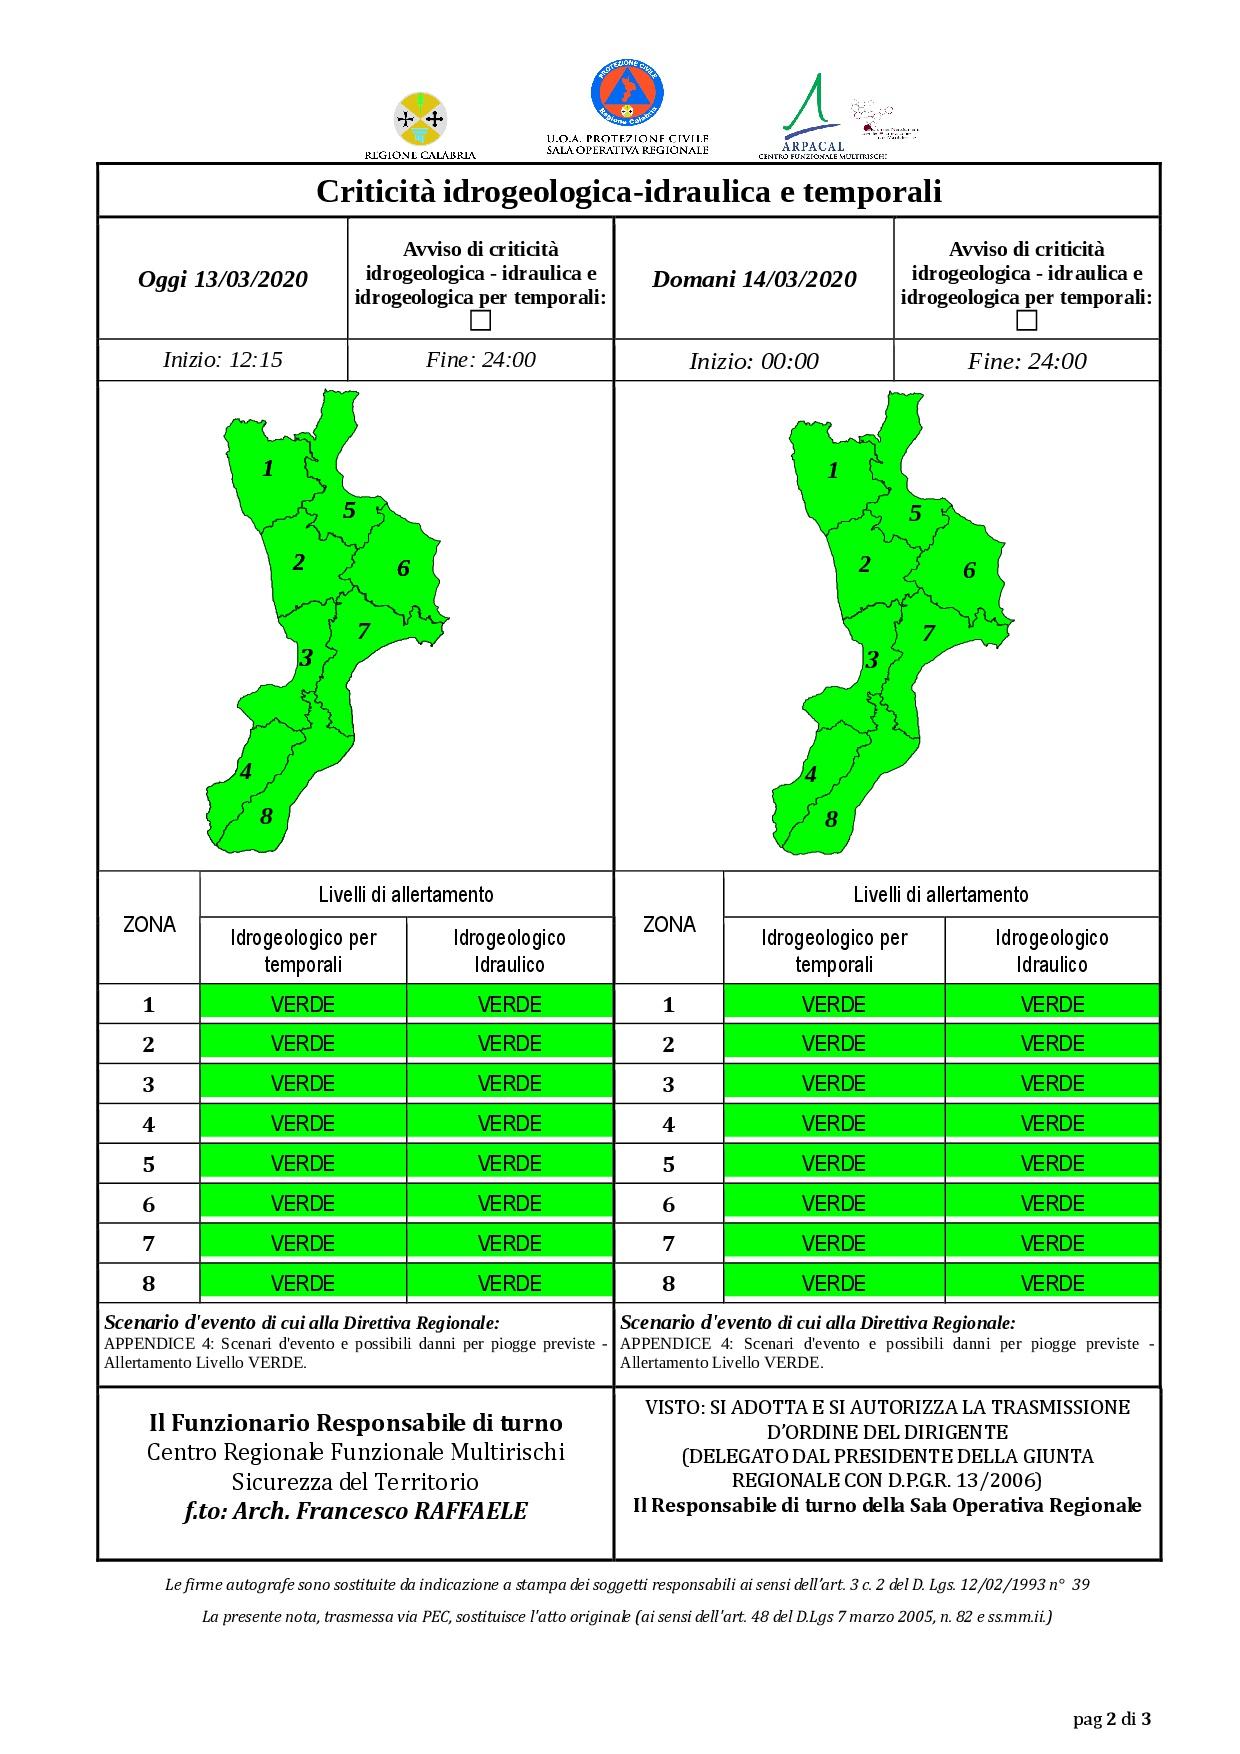 Criticità idrogeologica-idraulica e temporali in Calabria 13-03-2020